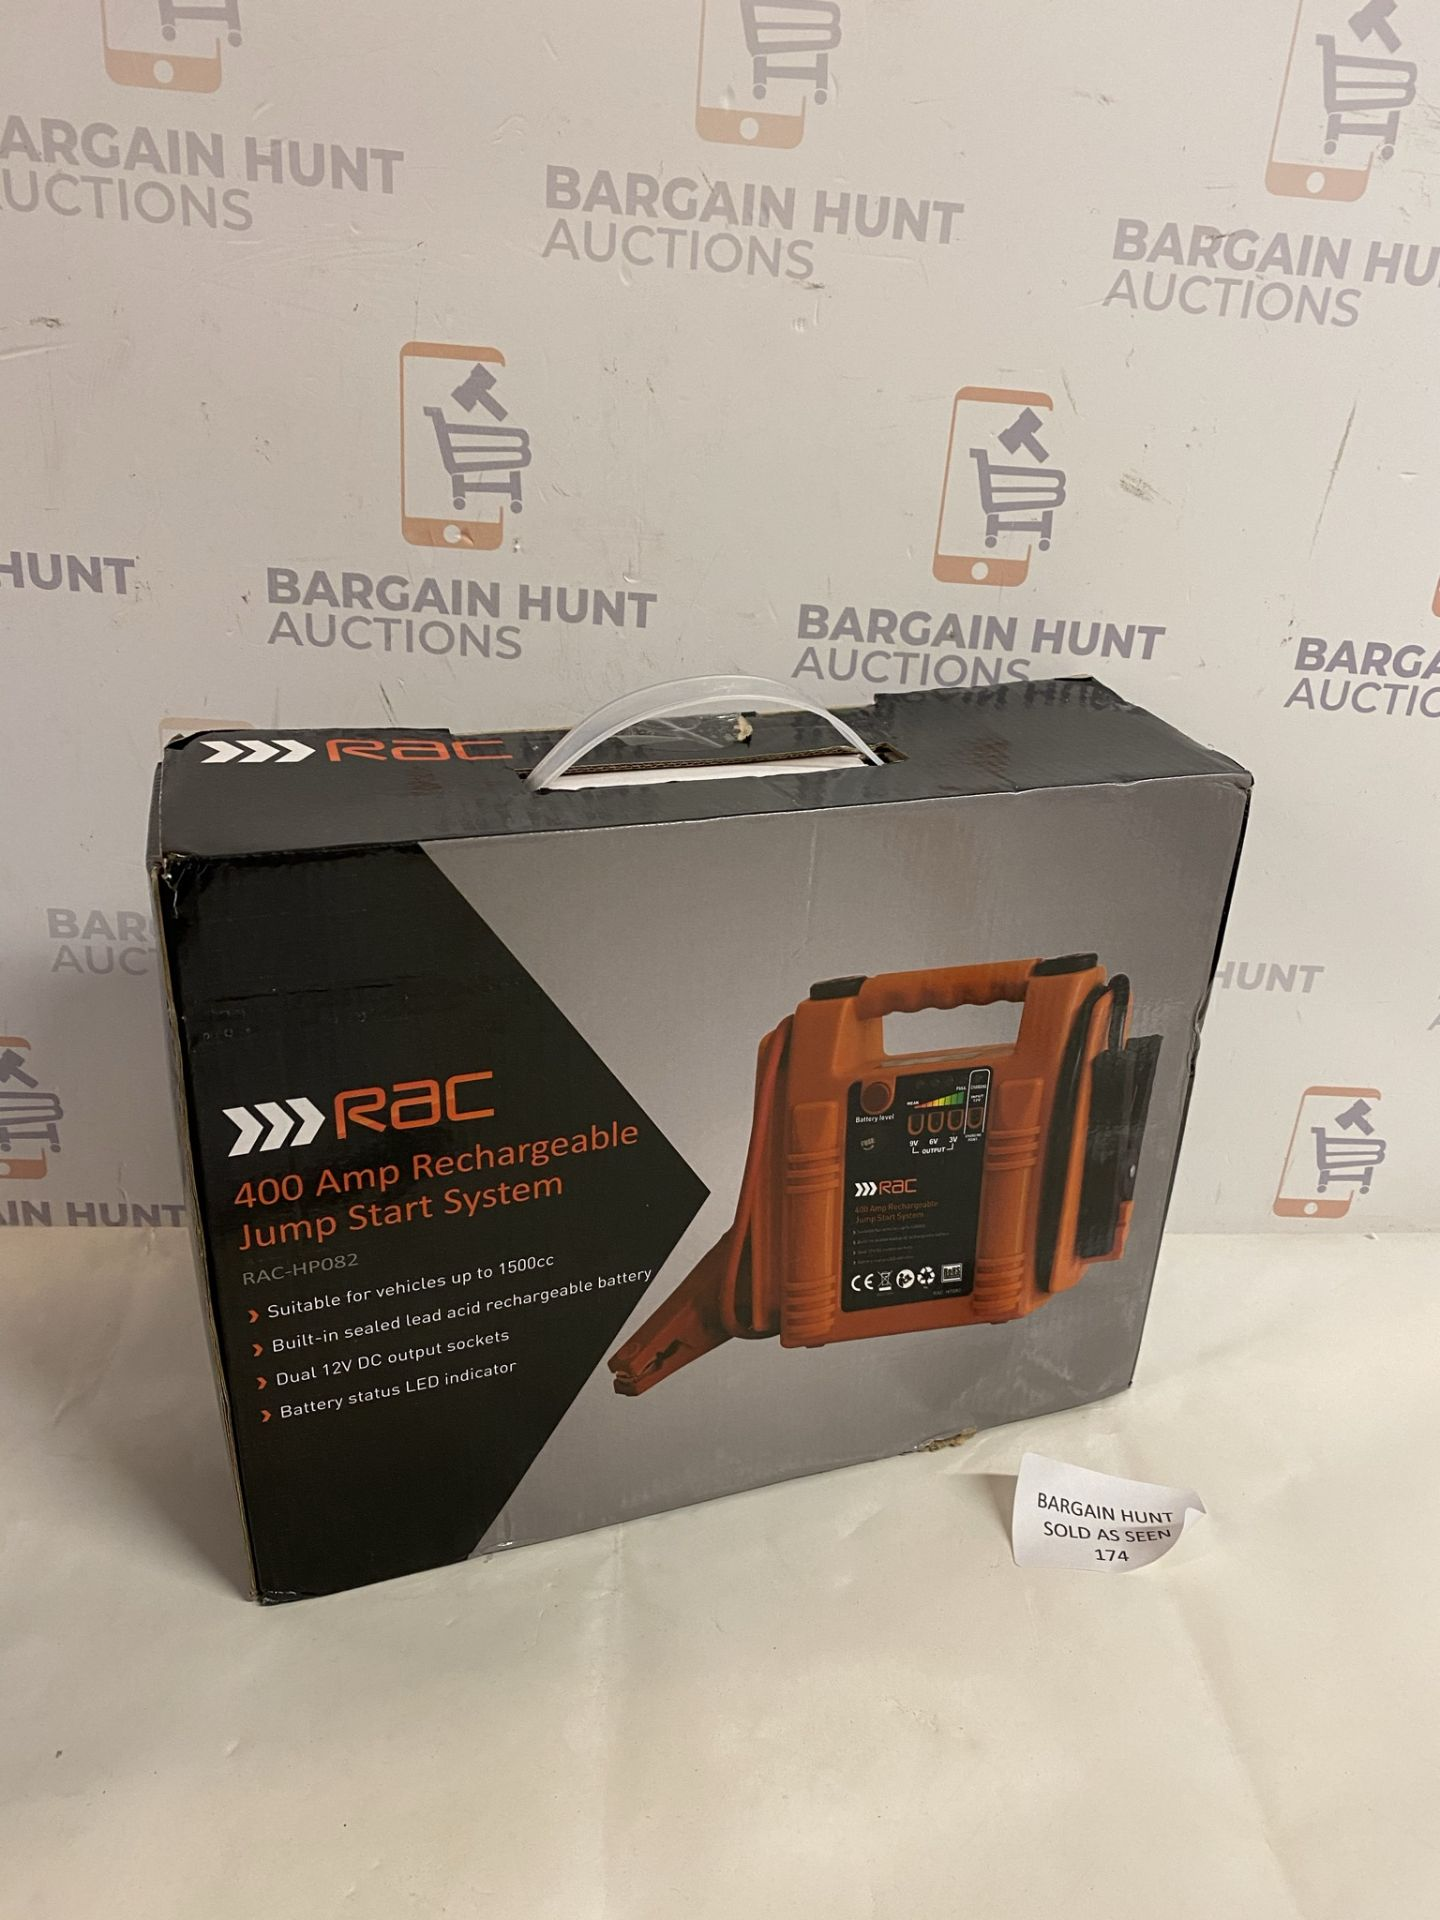 RAC 400 Amp Recahrgeable Jump Start System RP £45